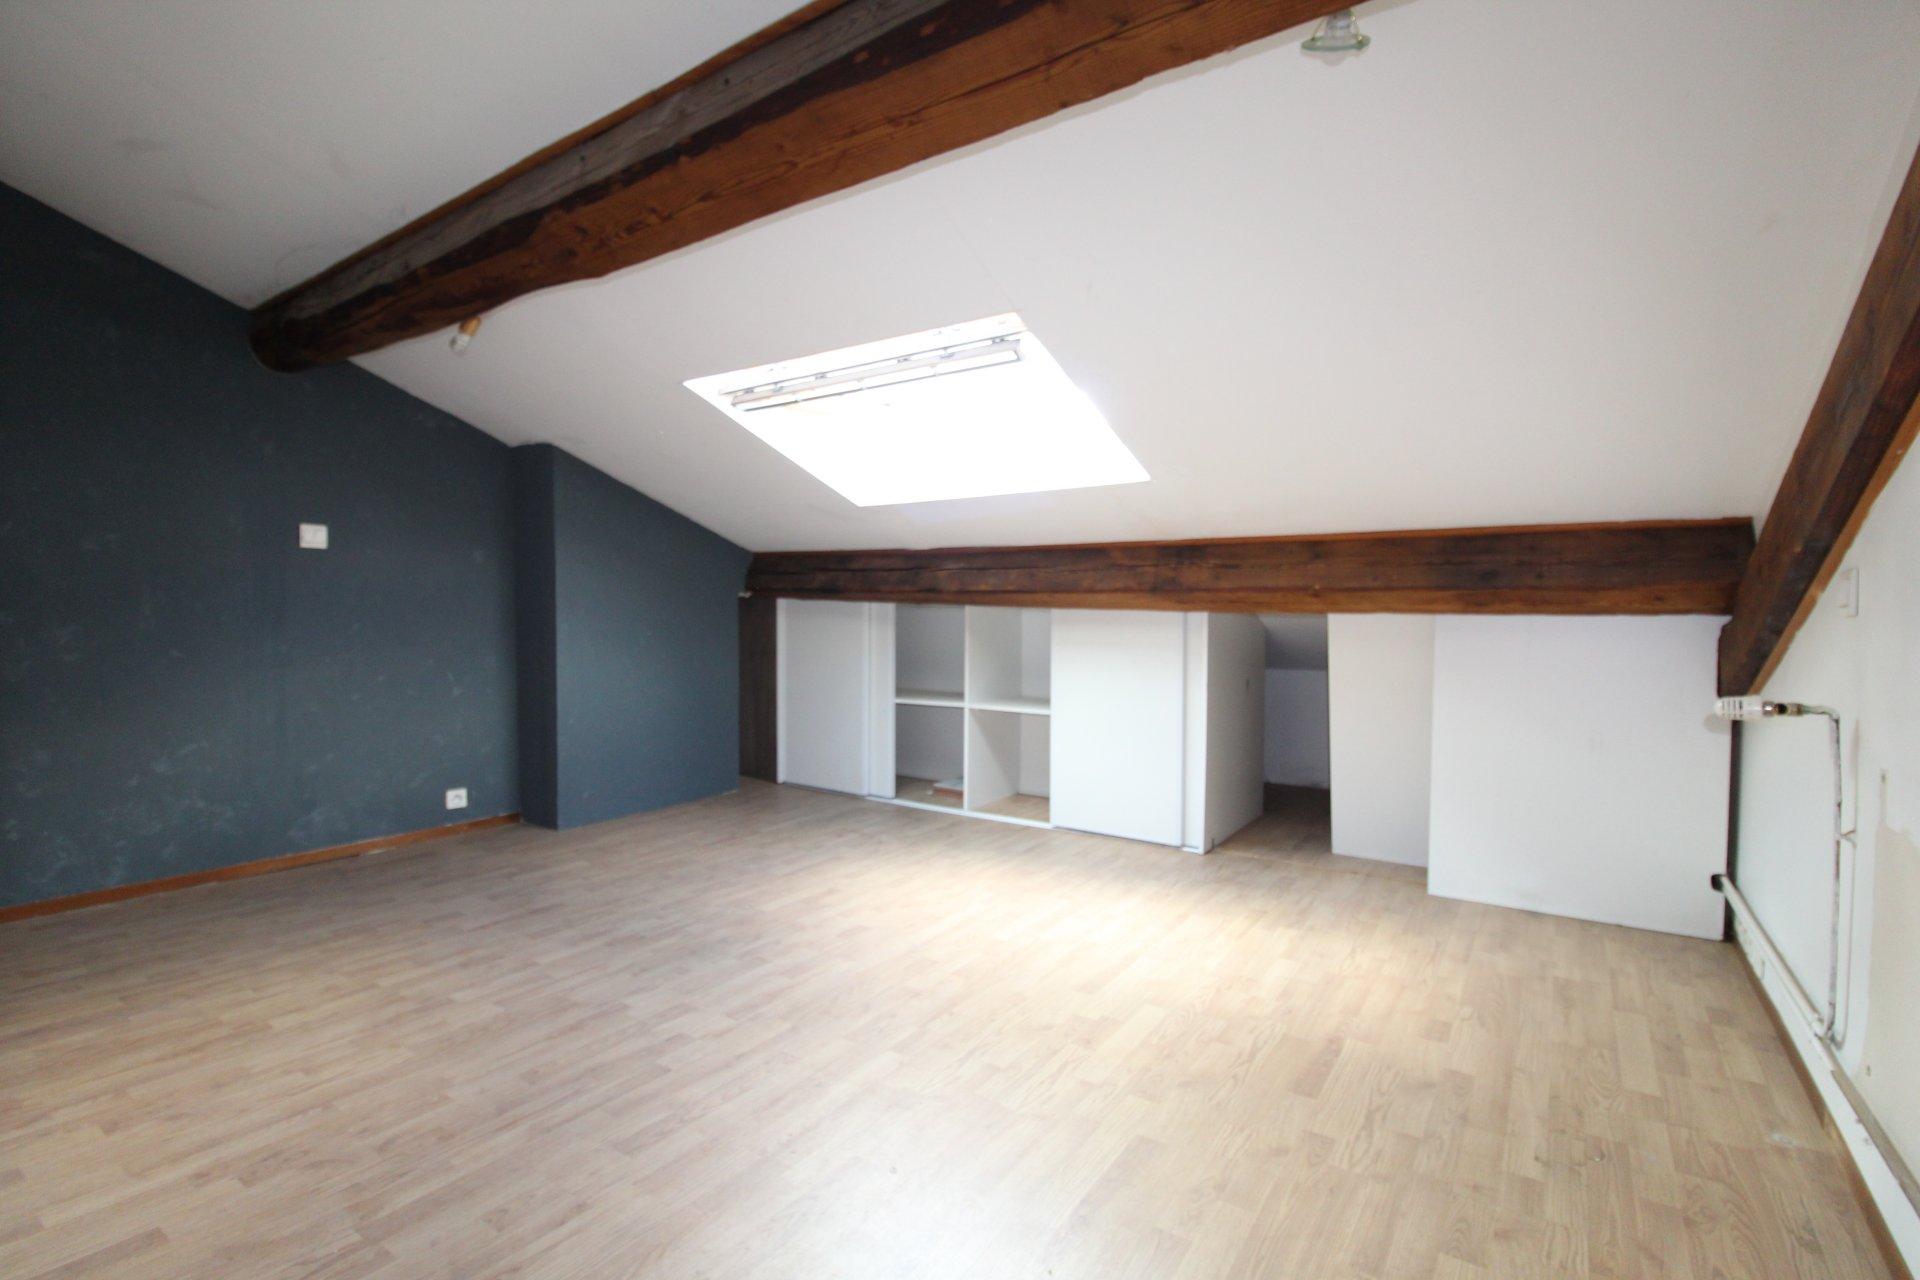 Saint-Etienne Appartement Duplex T3 86,02m2